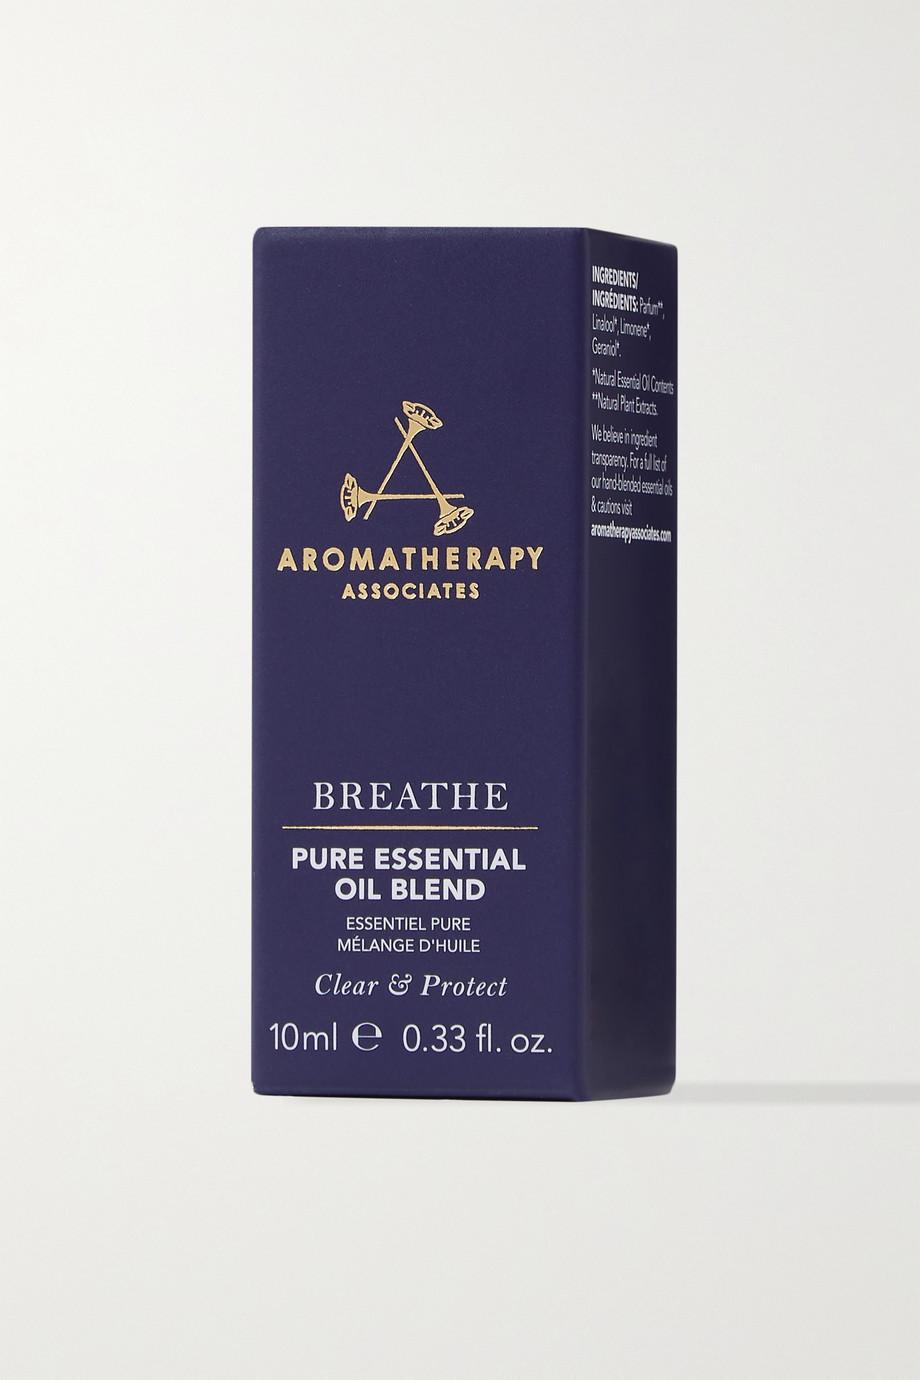 Aromatherapy Associates Breathe Pure Essential Oil Blend, 10ml